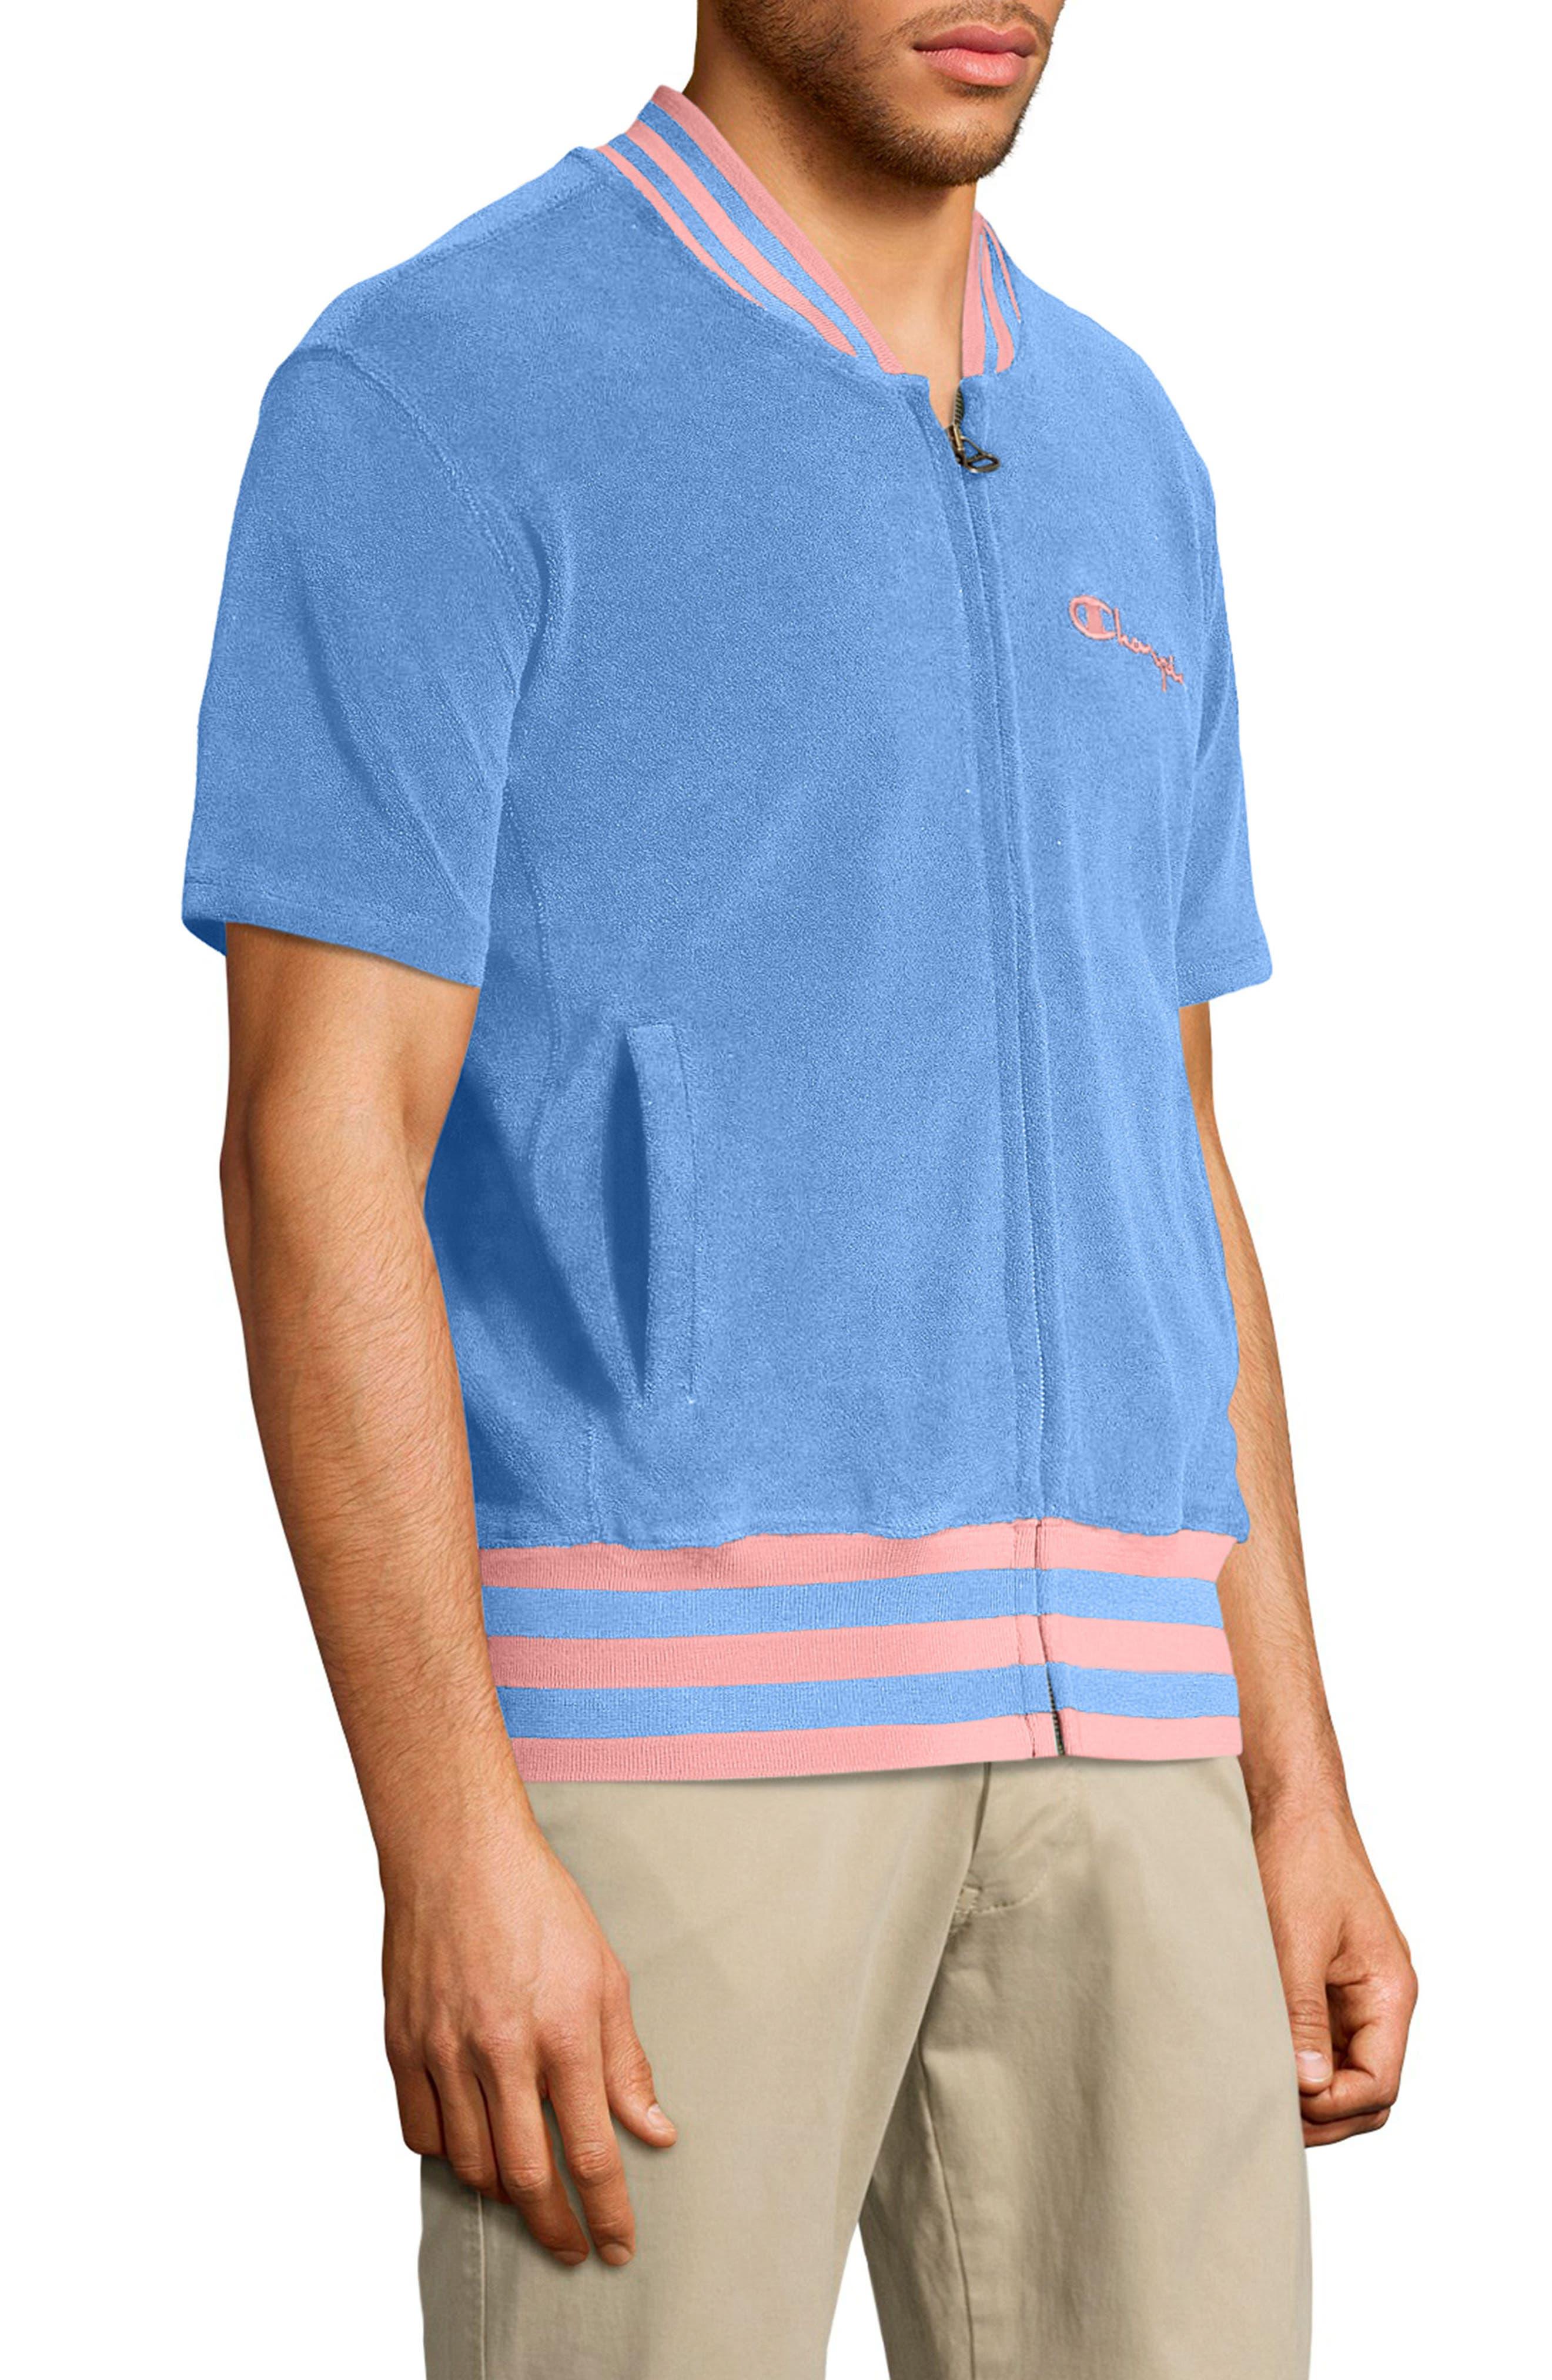 Sponge Terry Stripe Full Zip Sweatshirt,                             Alternate thumbnail 3, color,                             452